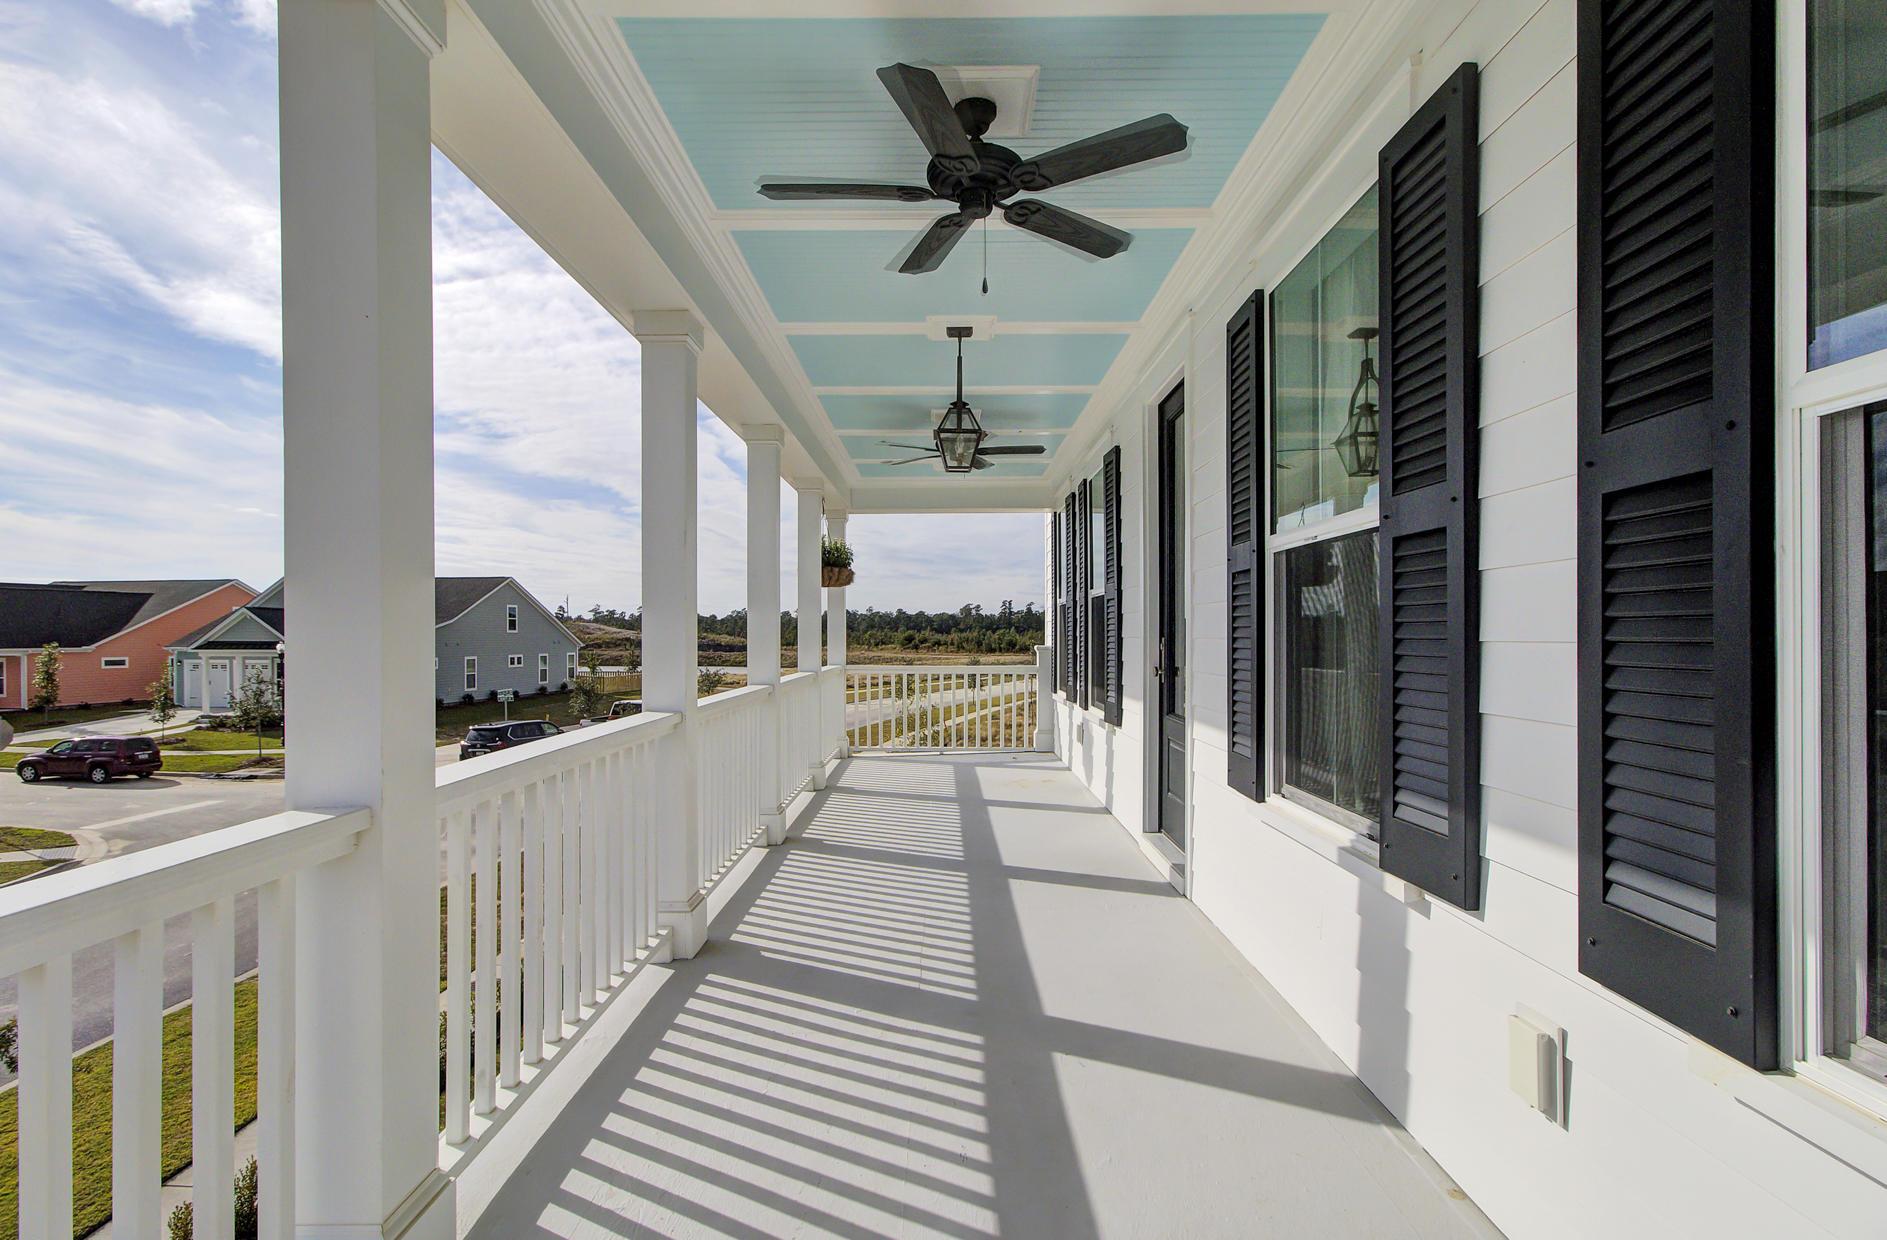 Carnes Crossroads Homes For Sale - 185 Callibluff, Summerville, SC - 54